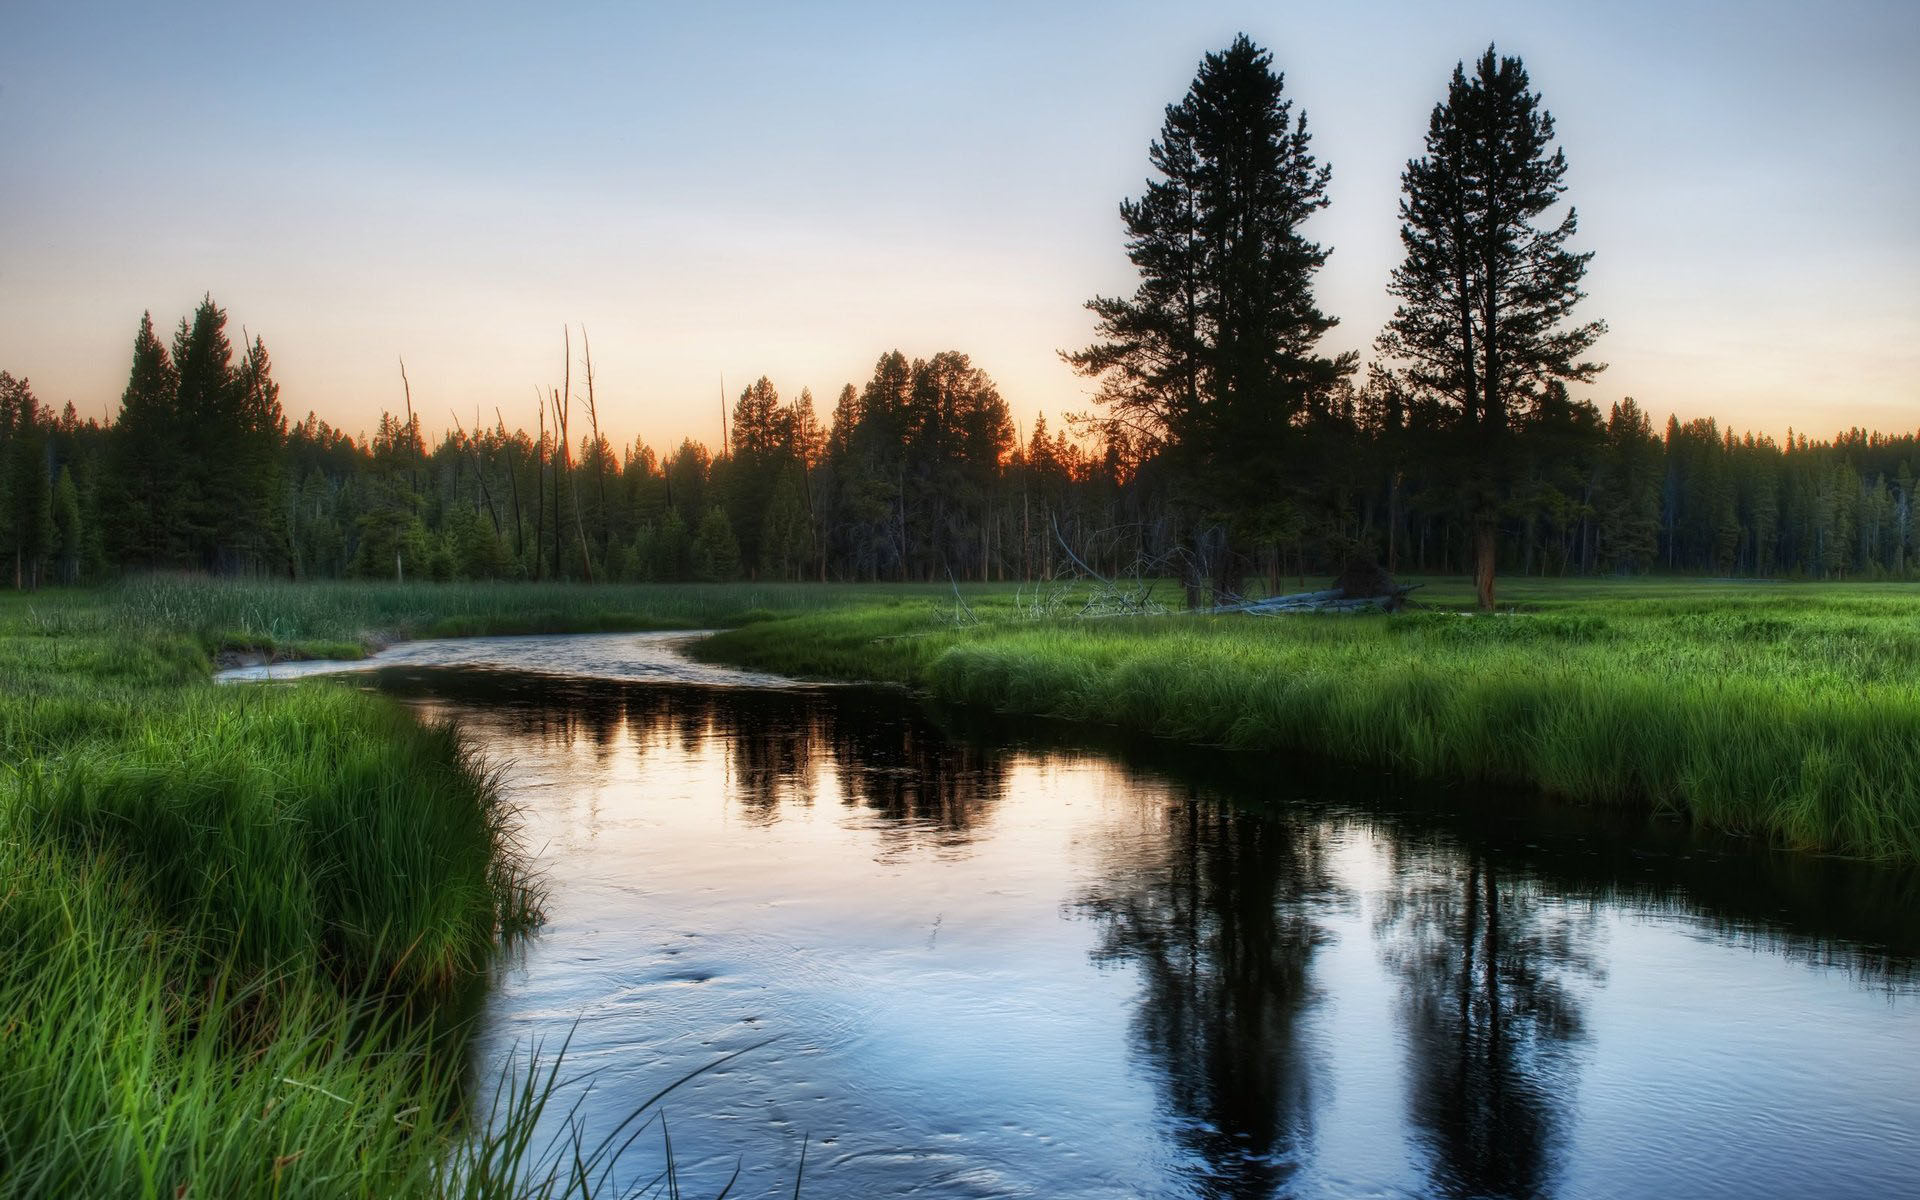 Природа речка зелень деревья утро